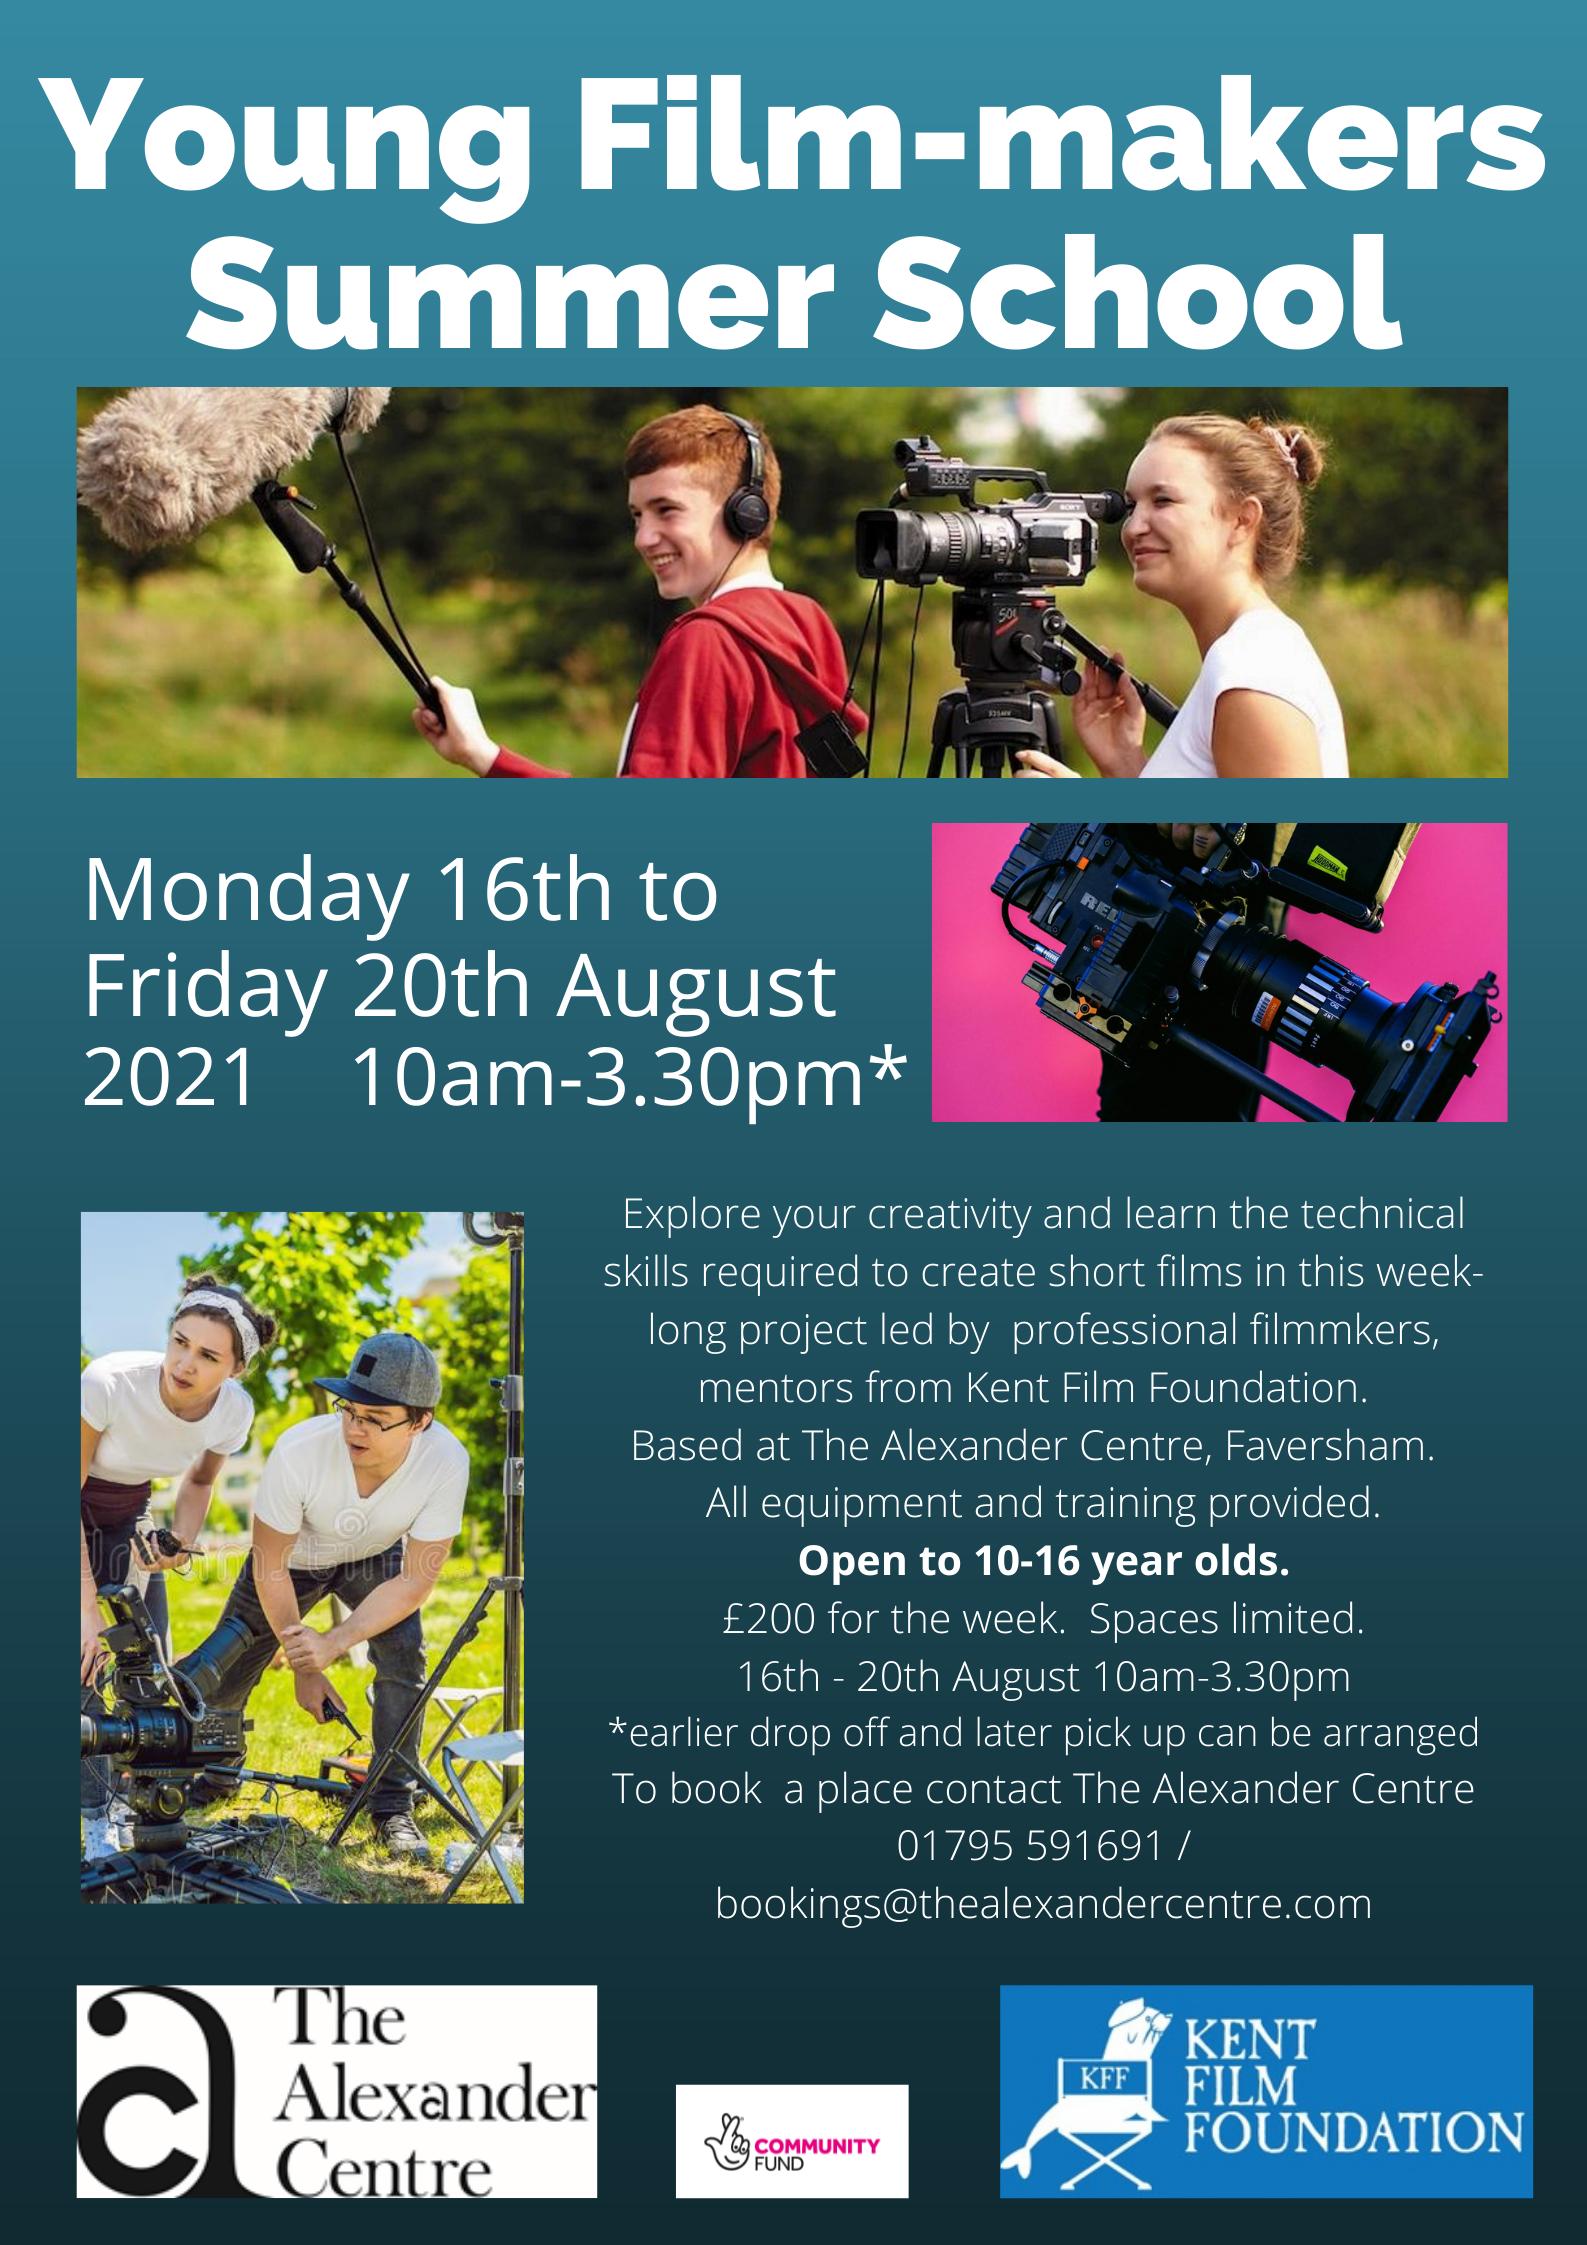 Young Film-makers' Summer School